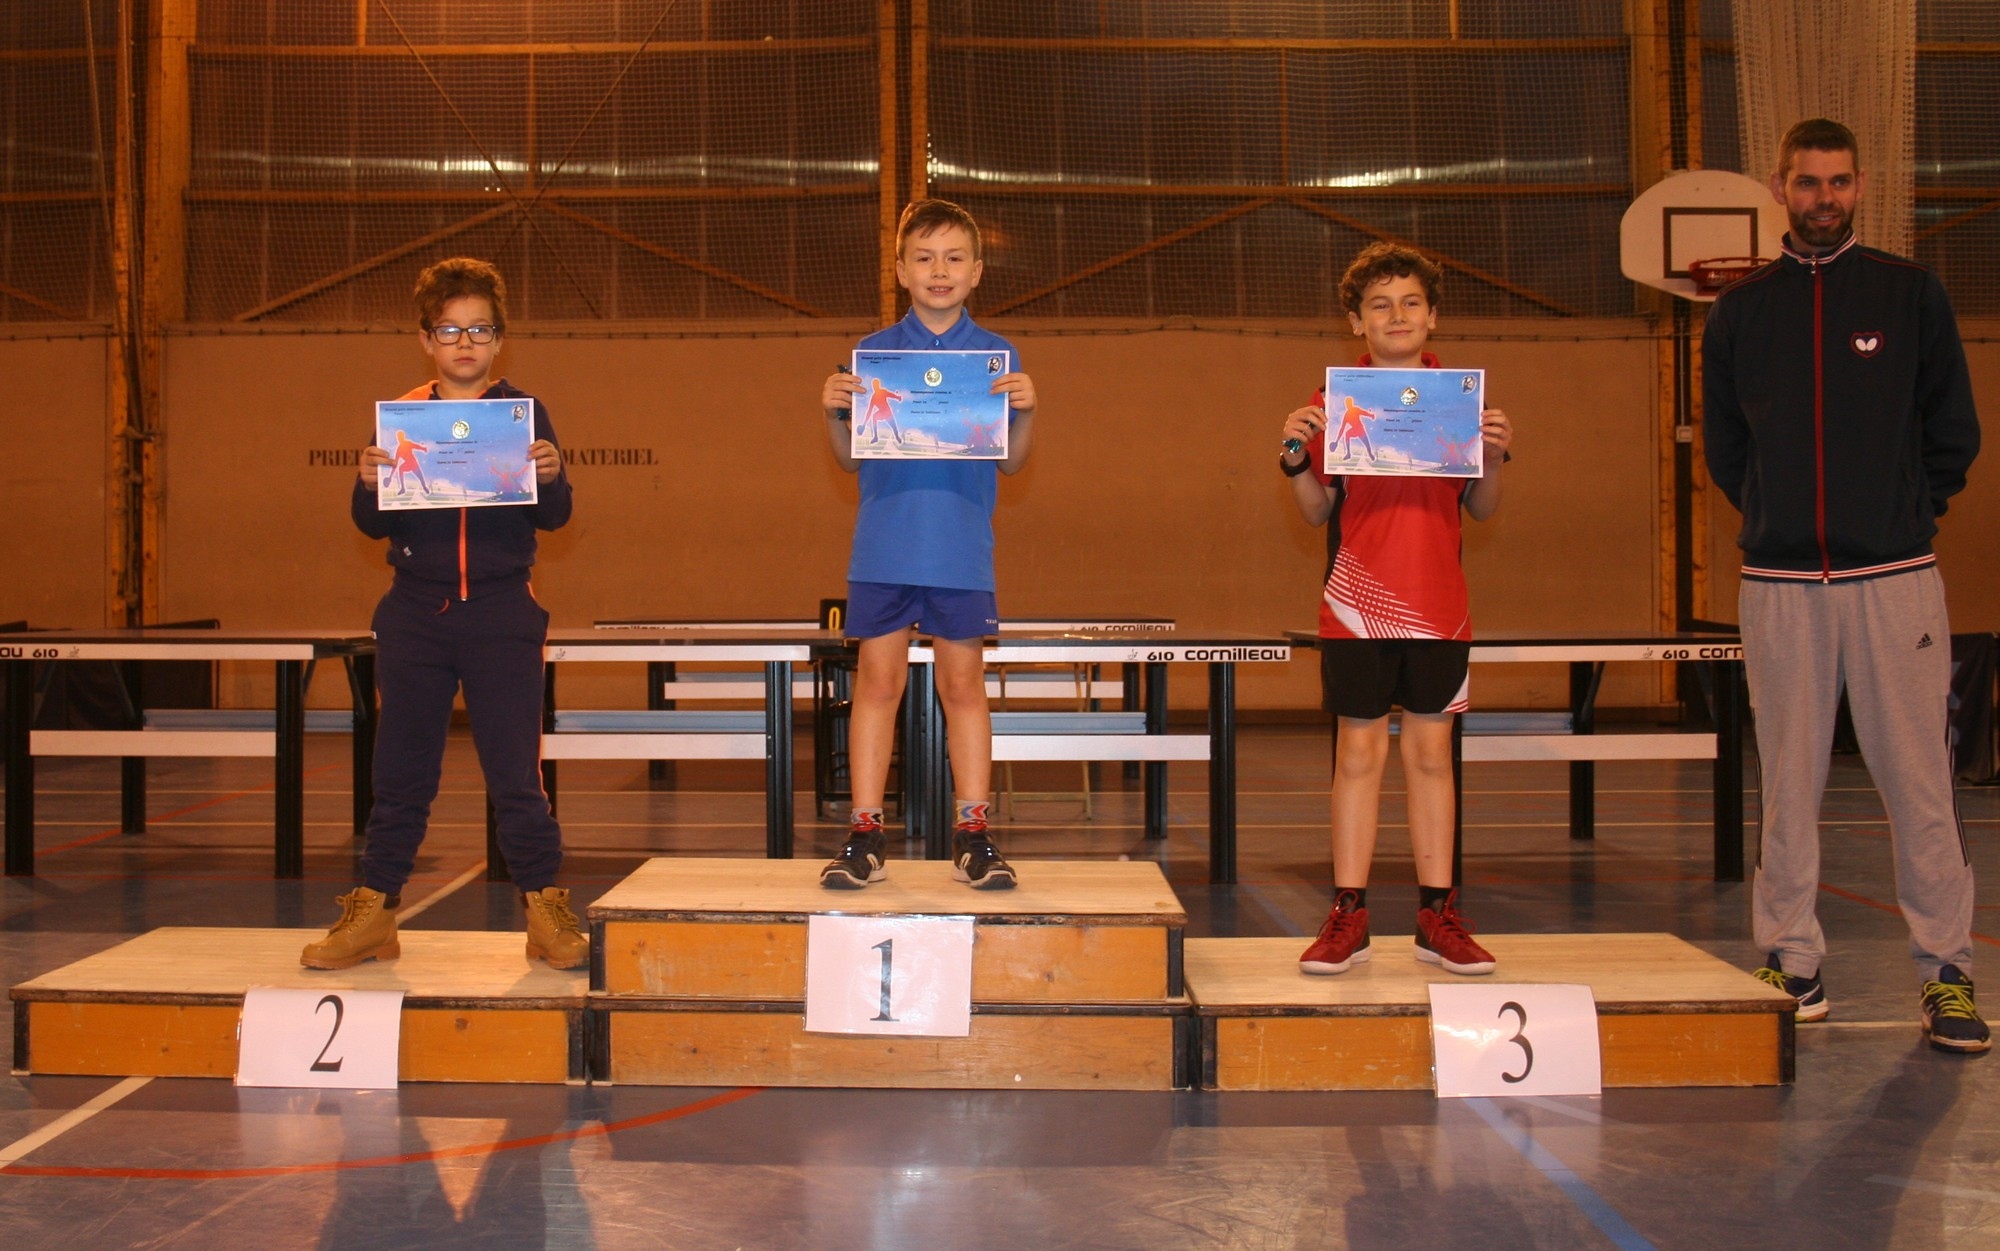 Chagny tennis de table resultats 2eme tour grand prix - Resultat tennis de table pro a ...